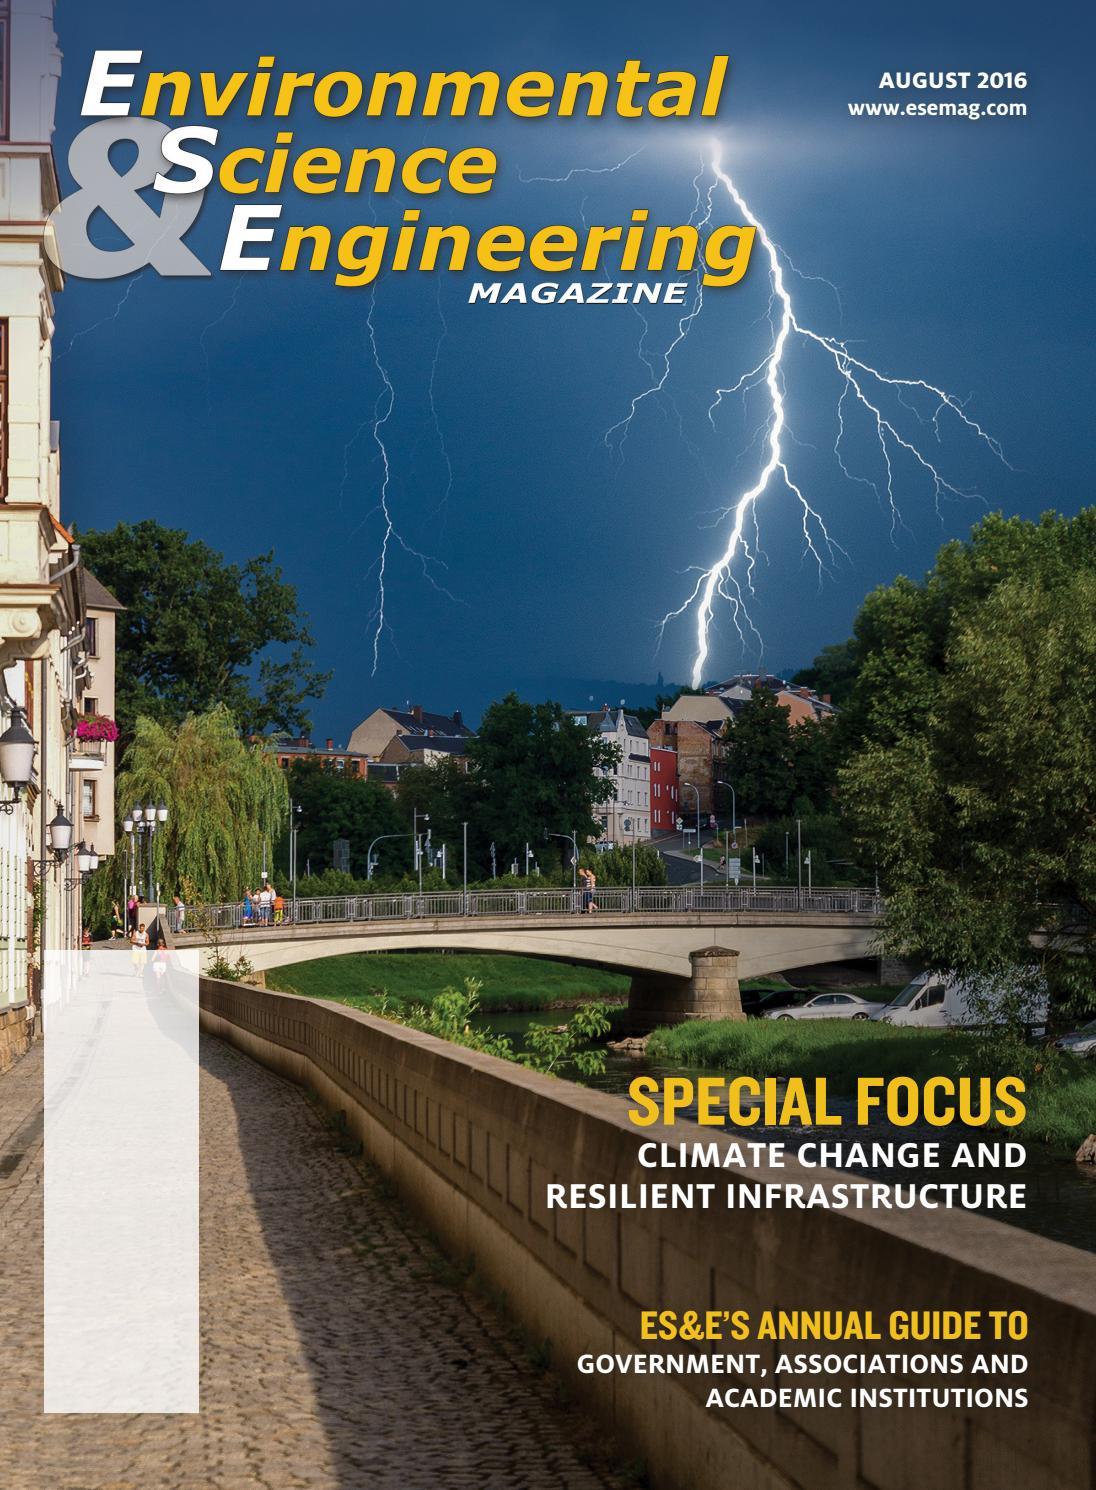 Environmental Science & Engineering Magazine (ESEMAG) August 2016 by